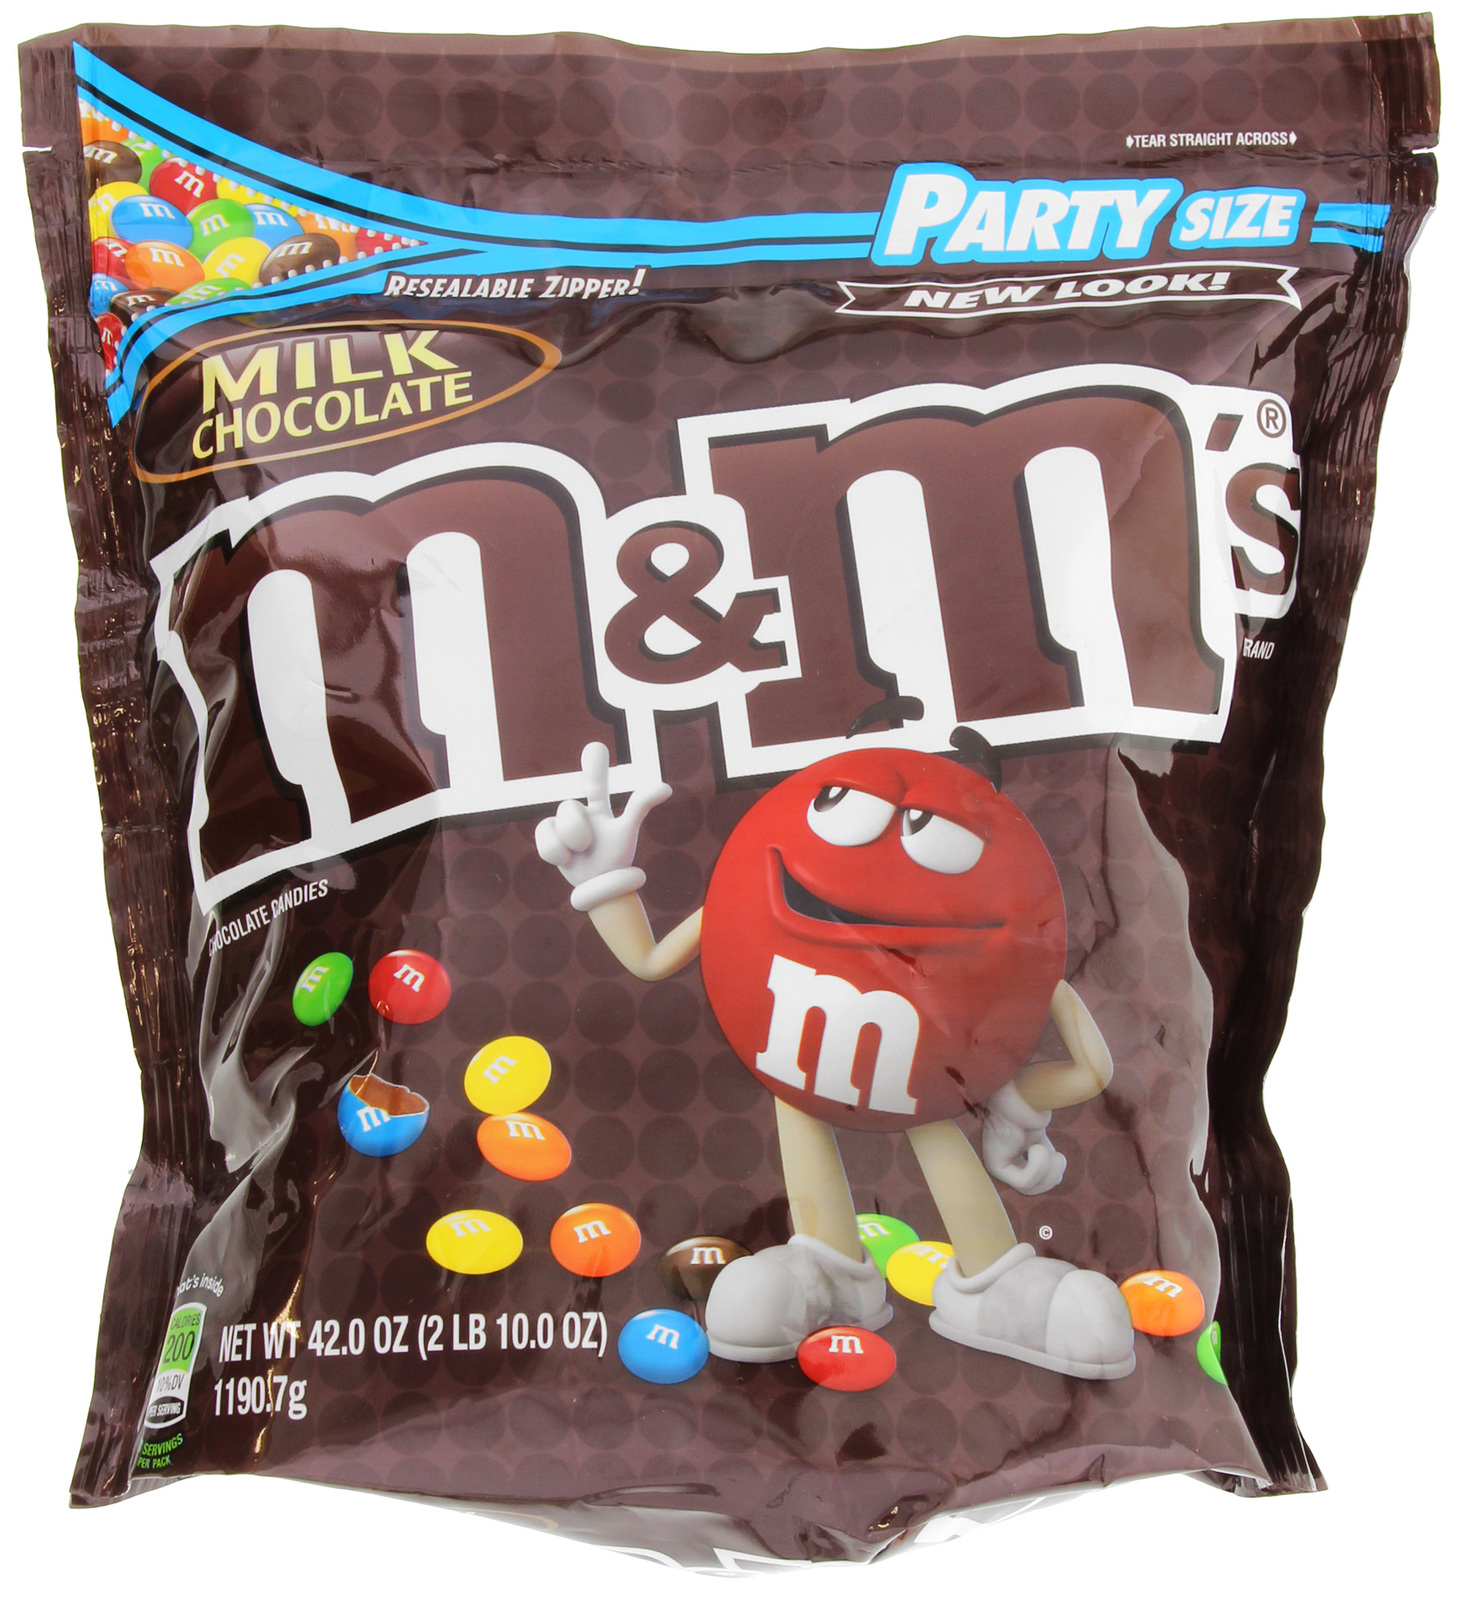 M&M's Milk Chocolate Party Bag (1.19kg) image